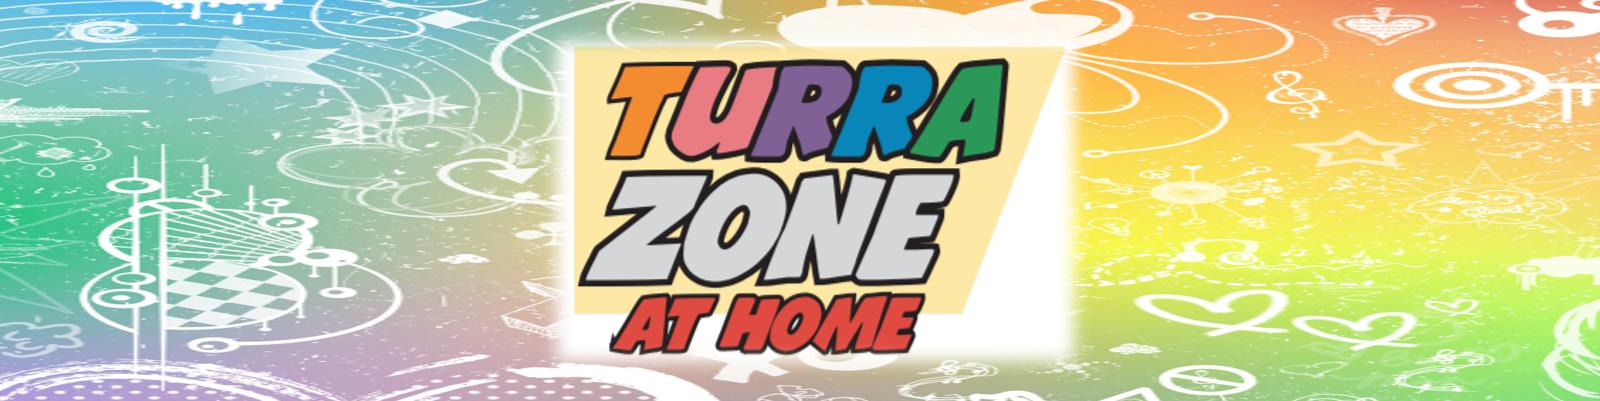 Turrazone Newsletter, Week #2 (8/5/2020)